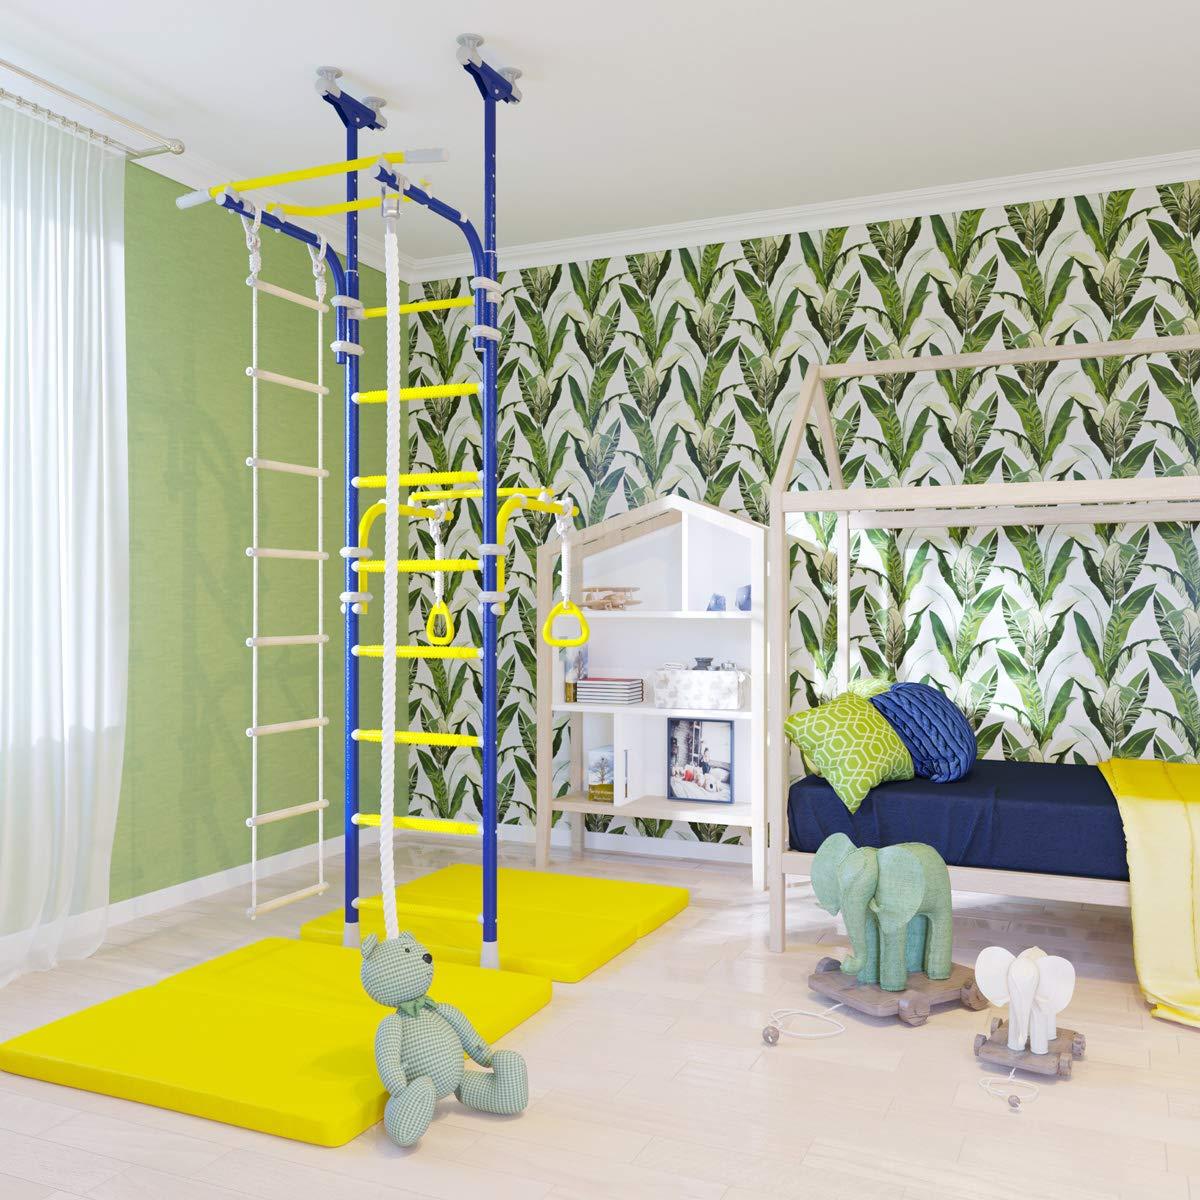 Home Gym Swedish Wall Playground Set for Schools Kids Room - Transforme